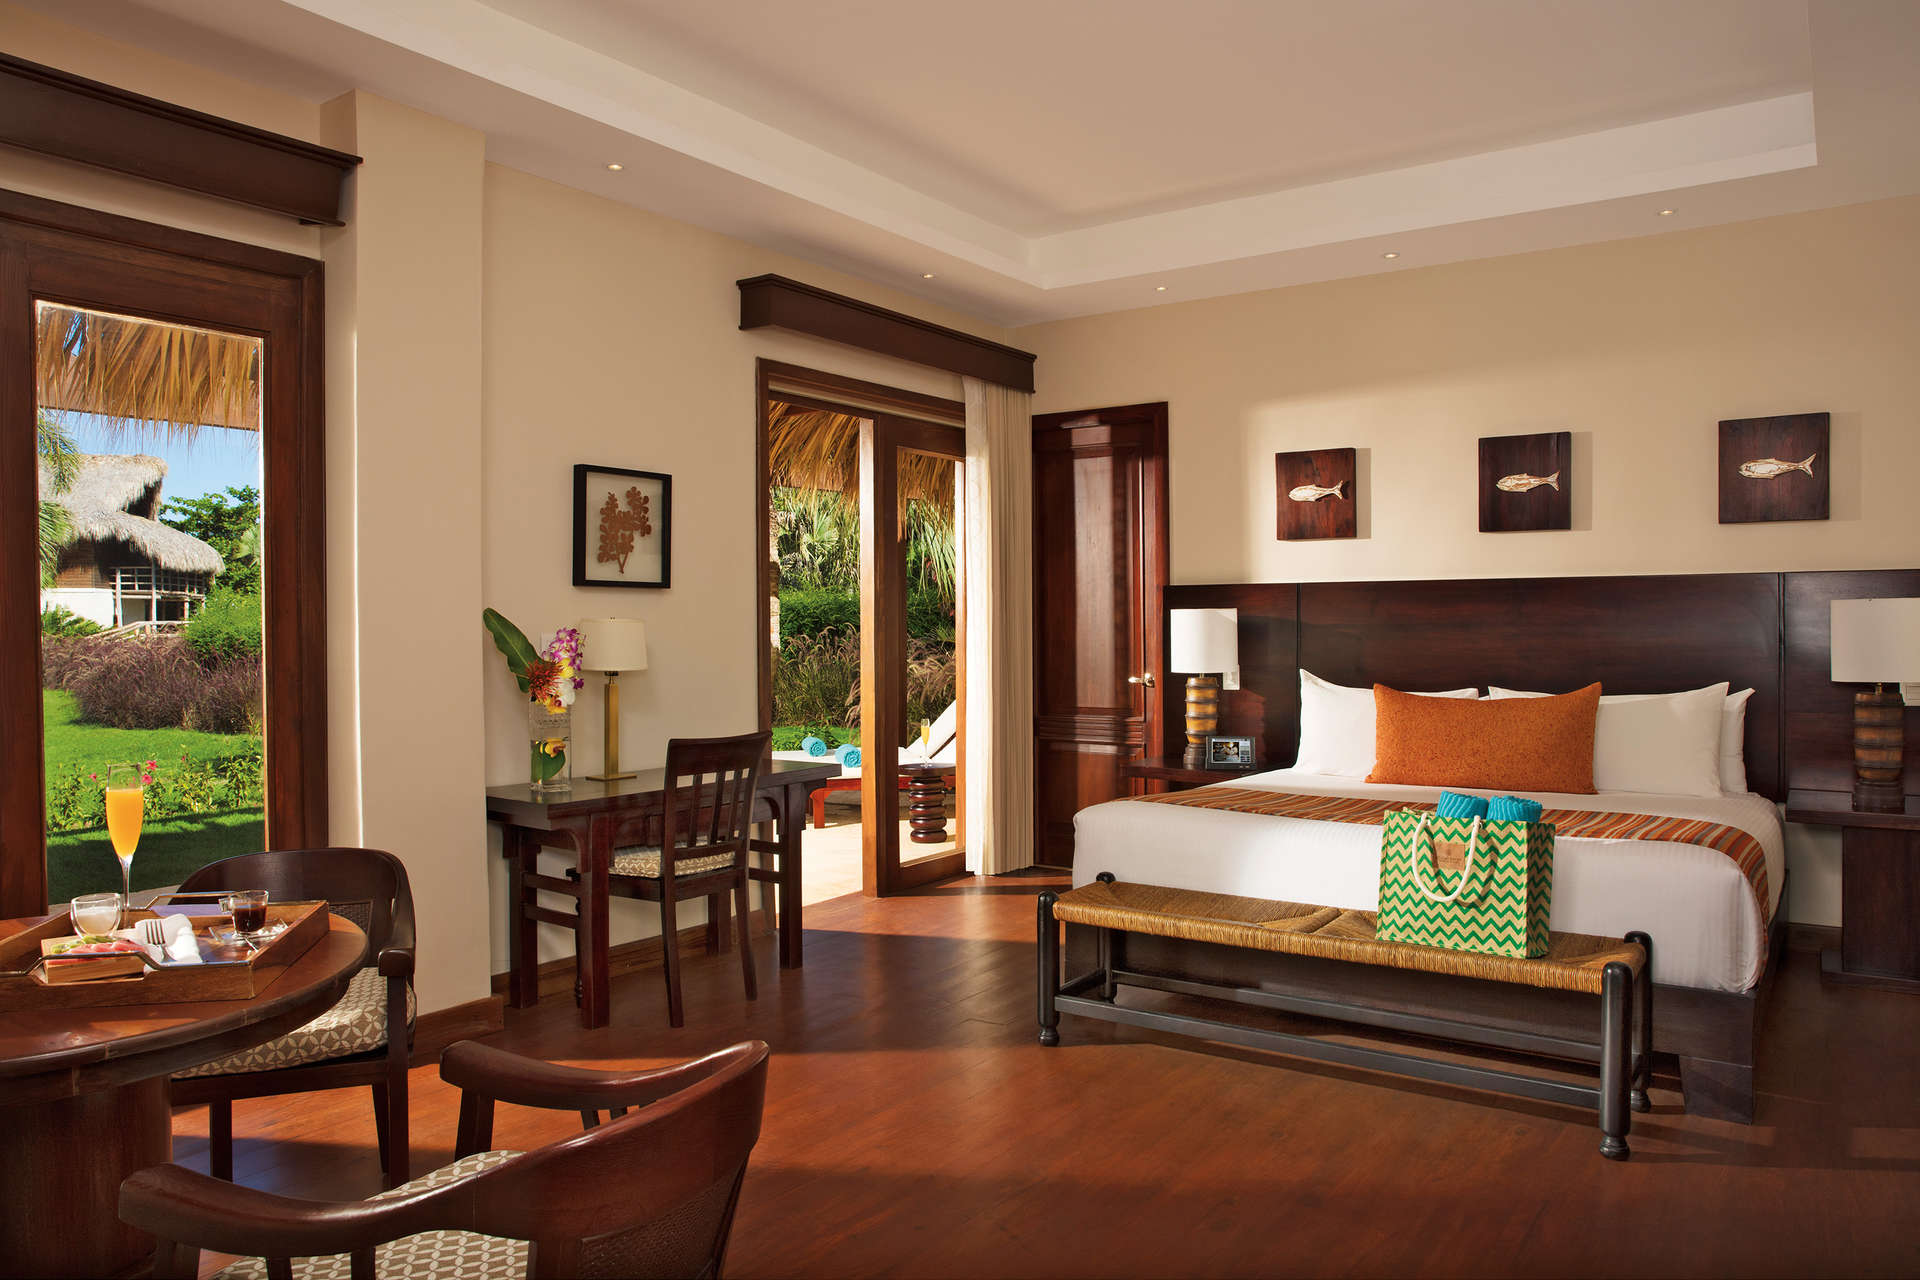 Luxury villa rentals caribbean - Dominican republic - Punta cana - Zoetry agua all inclusive resort - Garden View | Villa Dominicana - Image 1/17